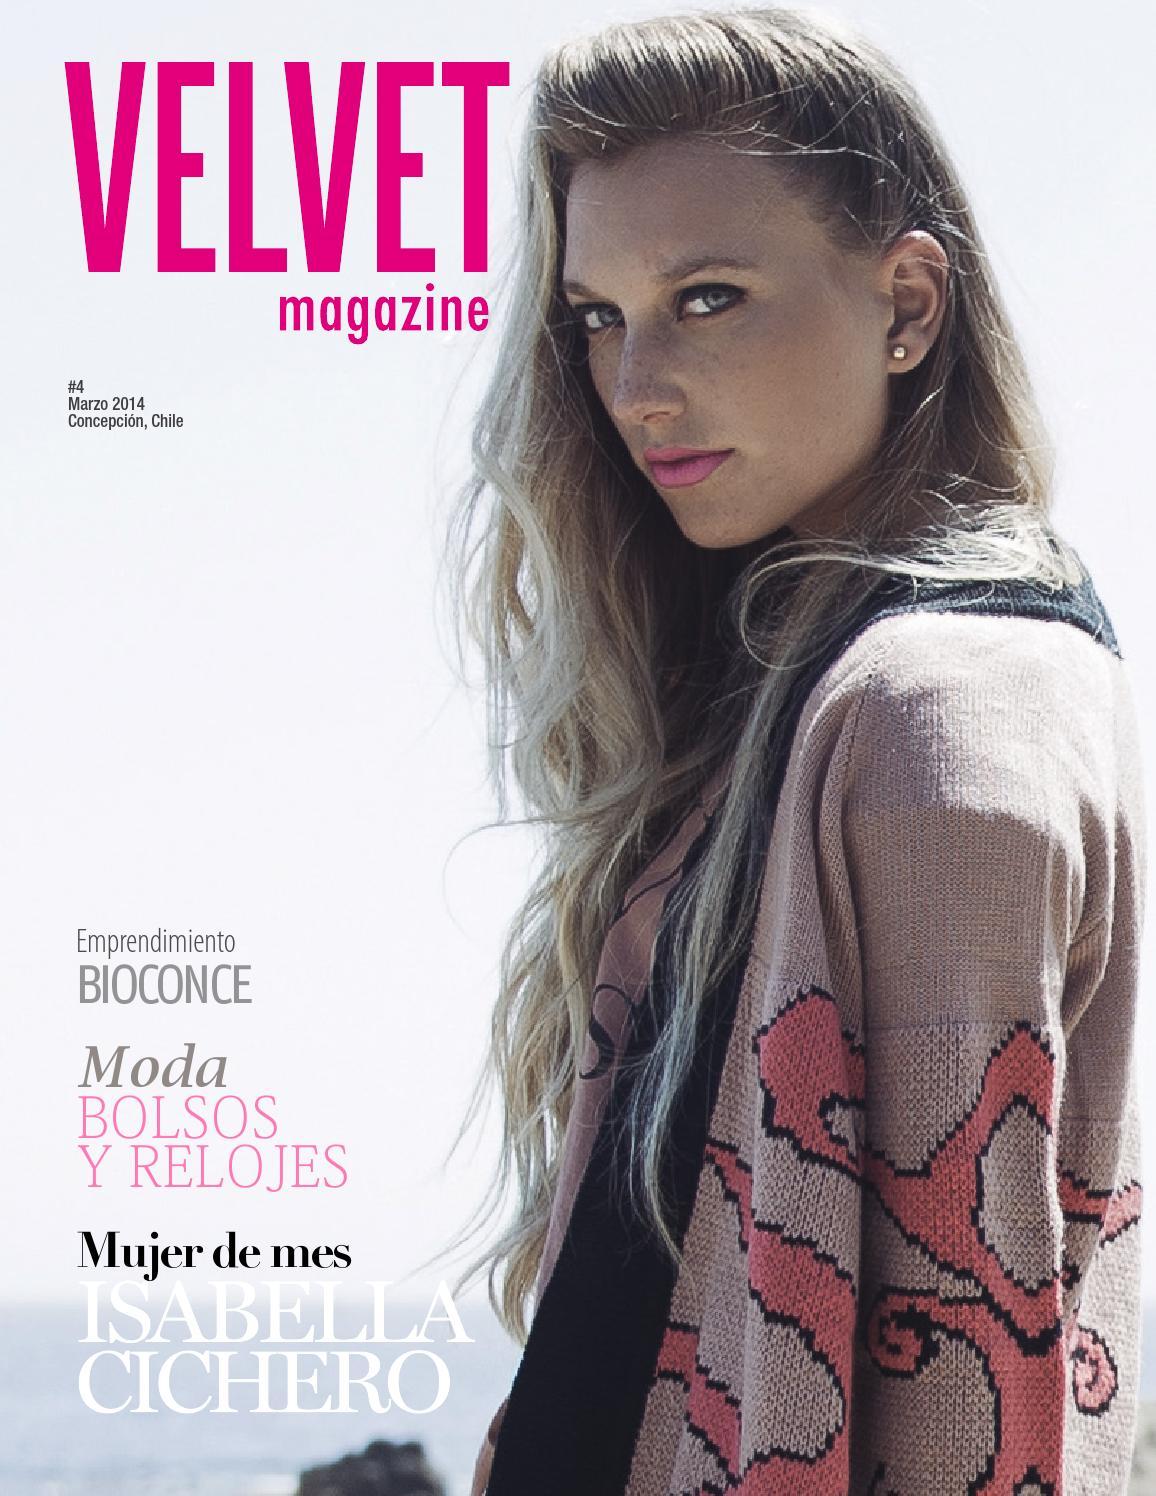 Velvet magazine  4 marzo 2014 by Revista Velvet - issuu 91eac97eb0168